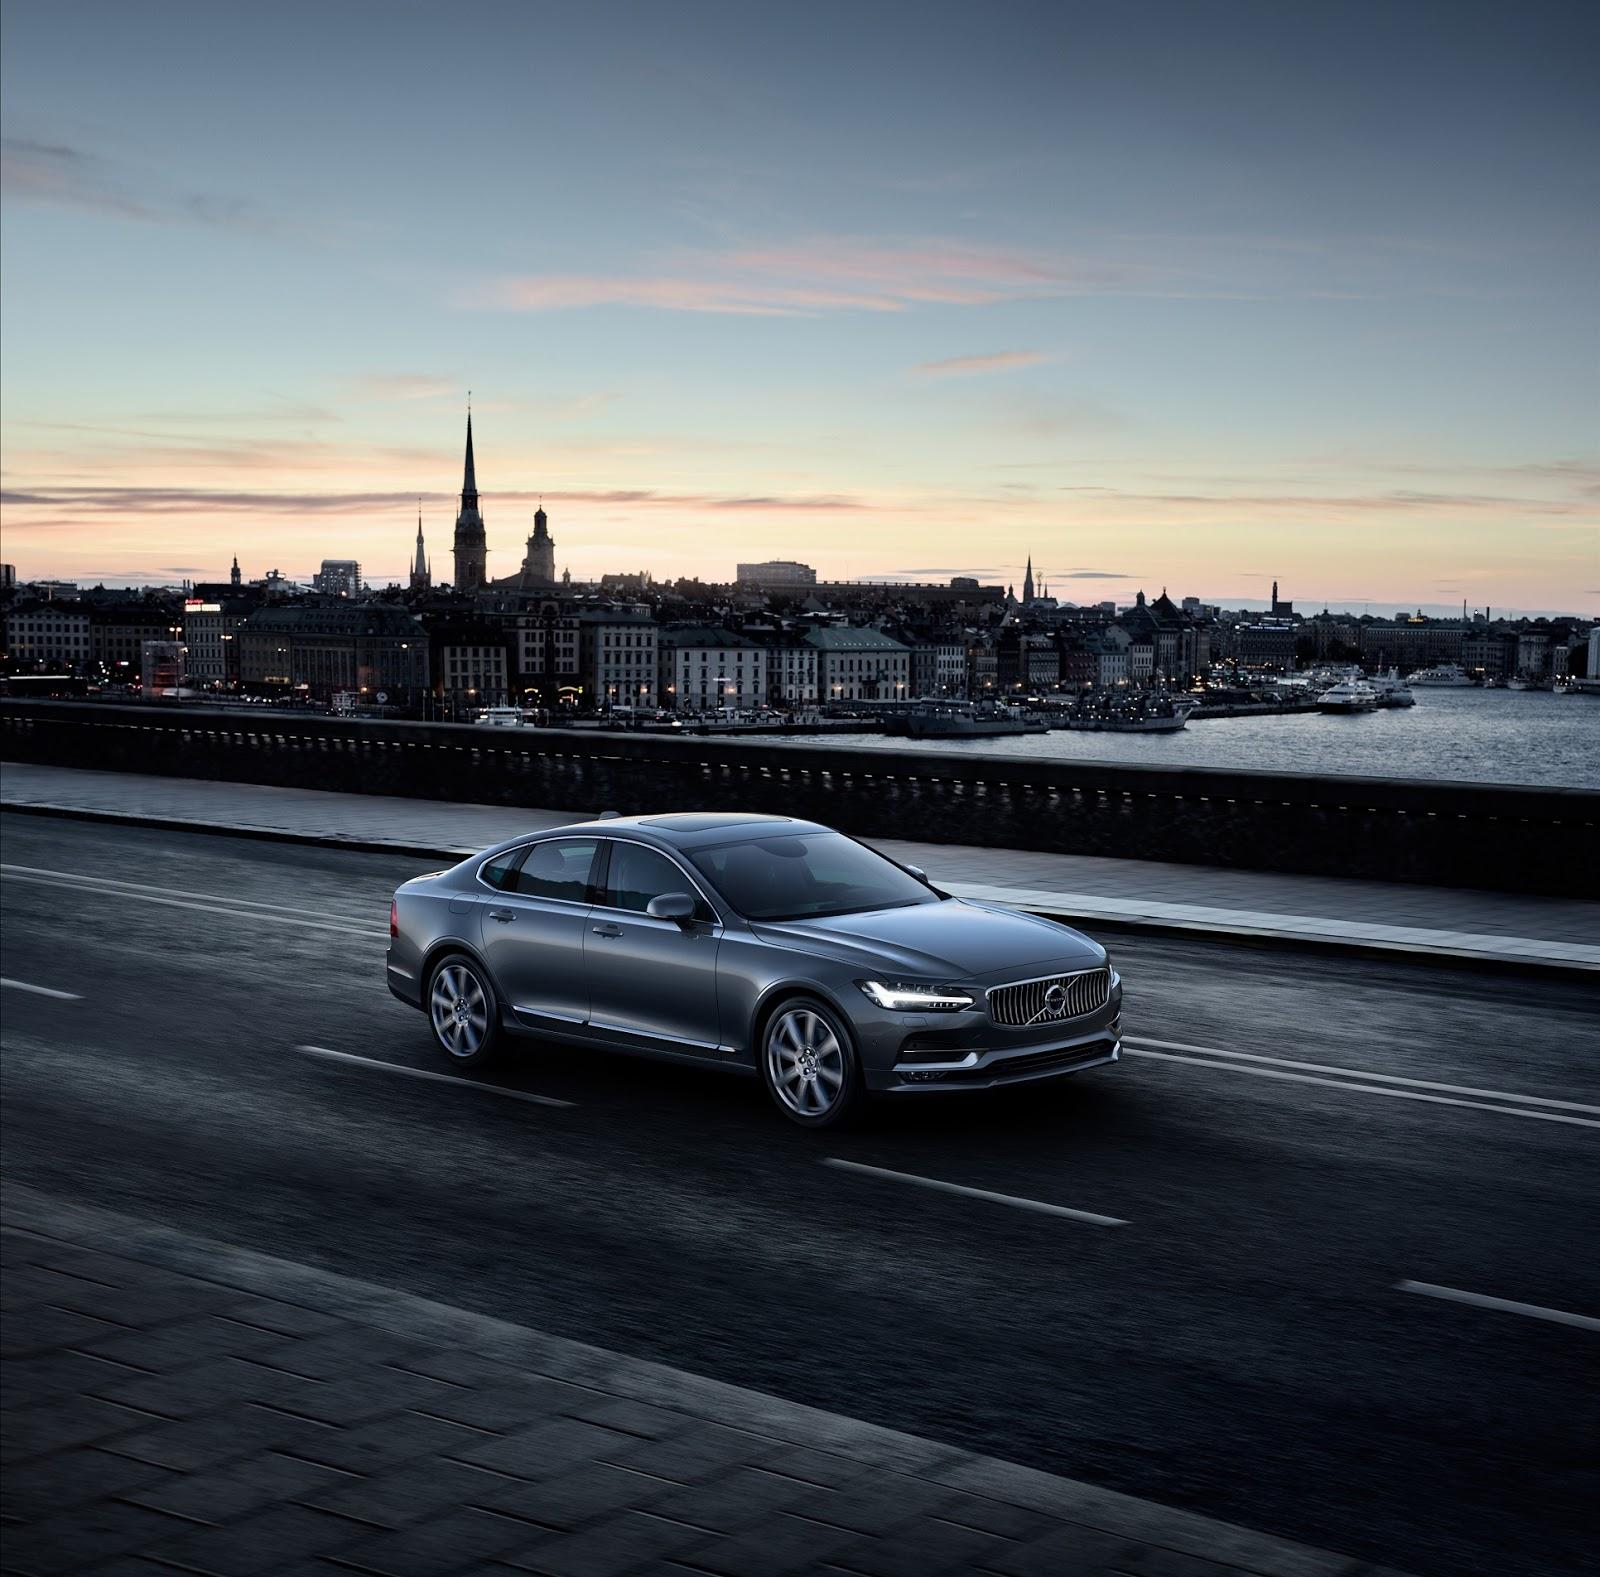 NEW%2BVOLVO%2BS90 170196 Location Front Quarter Osmium Grey Το νέο Volvo S90 έρχεται και βάζει φωτιά στον ανταγωνισμό premium sedan, Volvo, Volvo Cars, Volvo S90